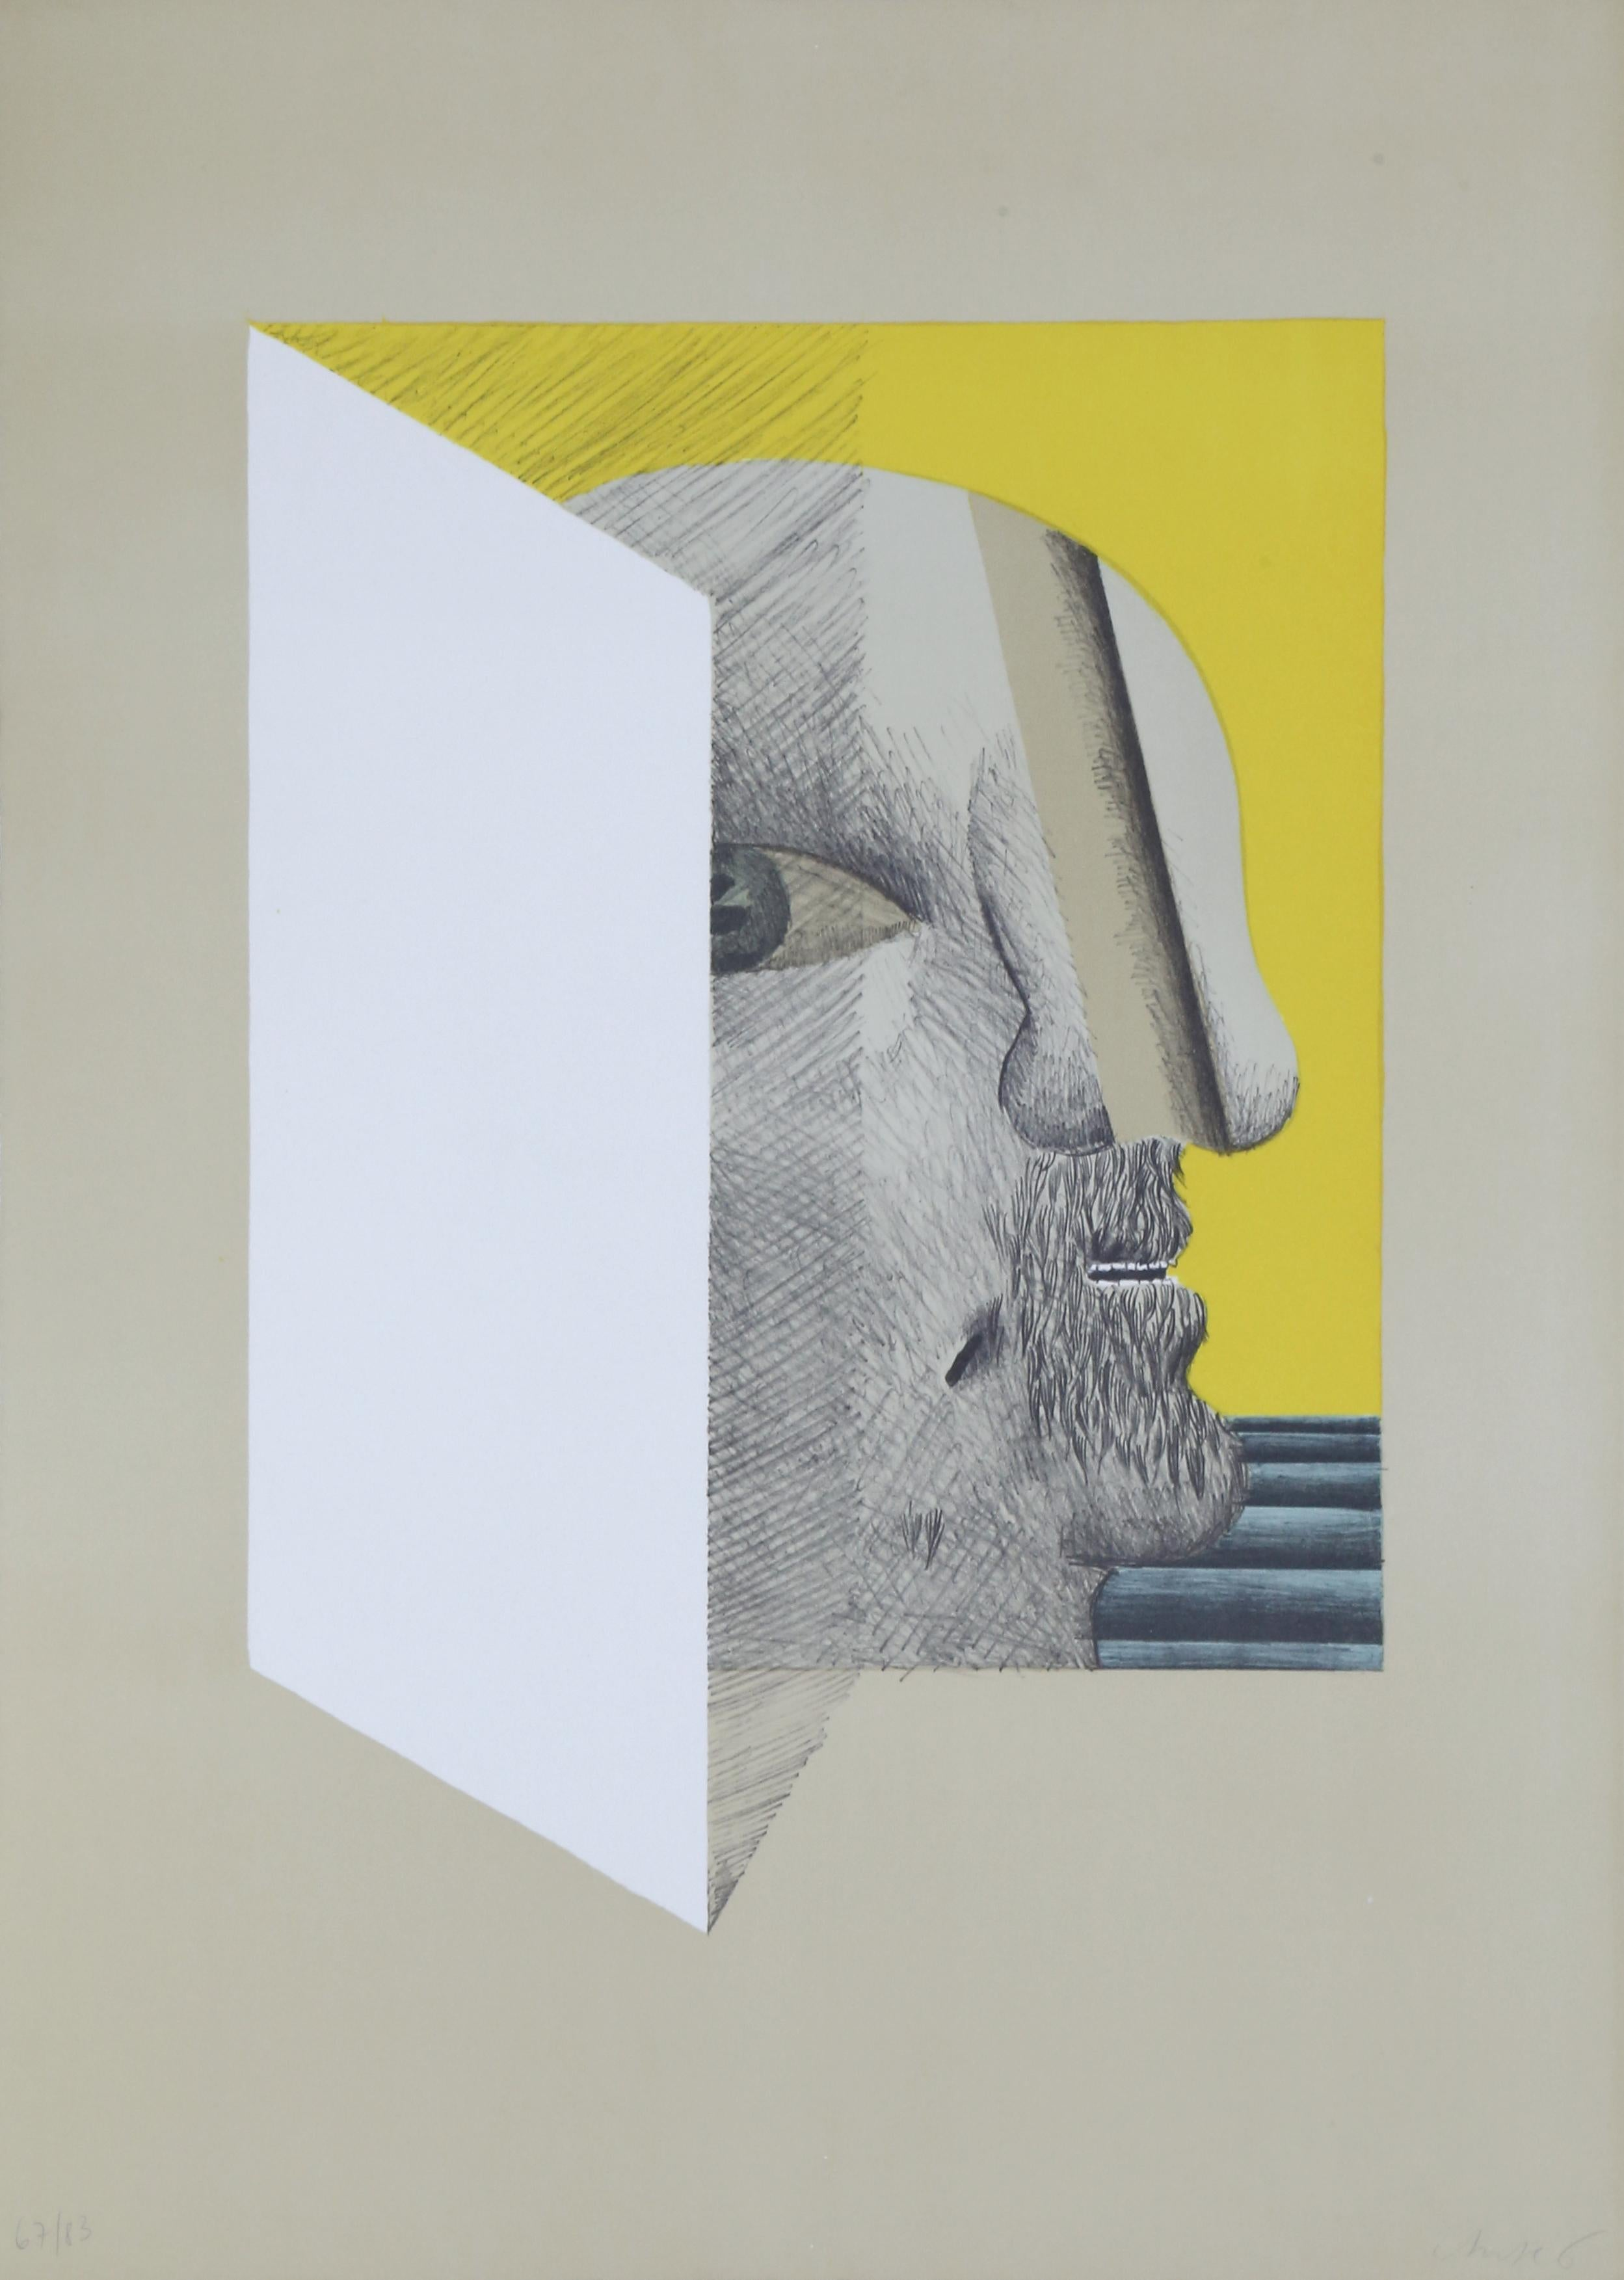 Faltblatt, Surrealist Lithograph by Horst Antes